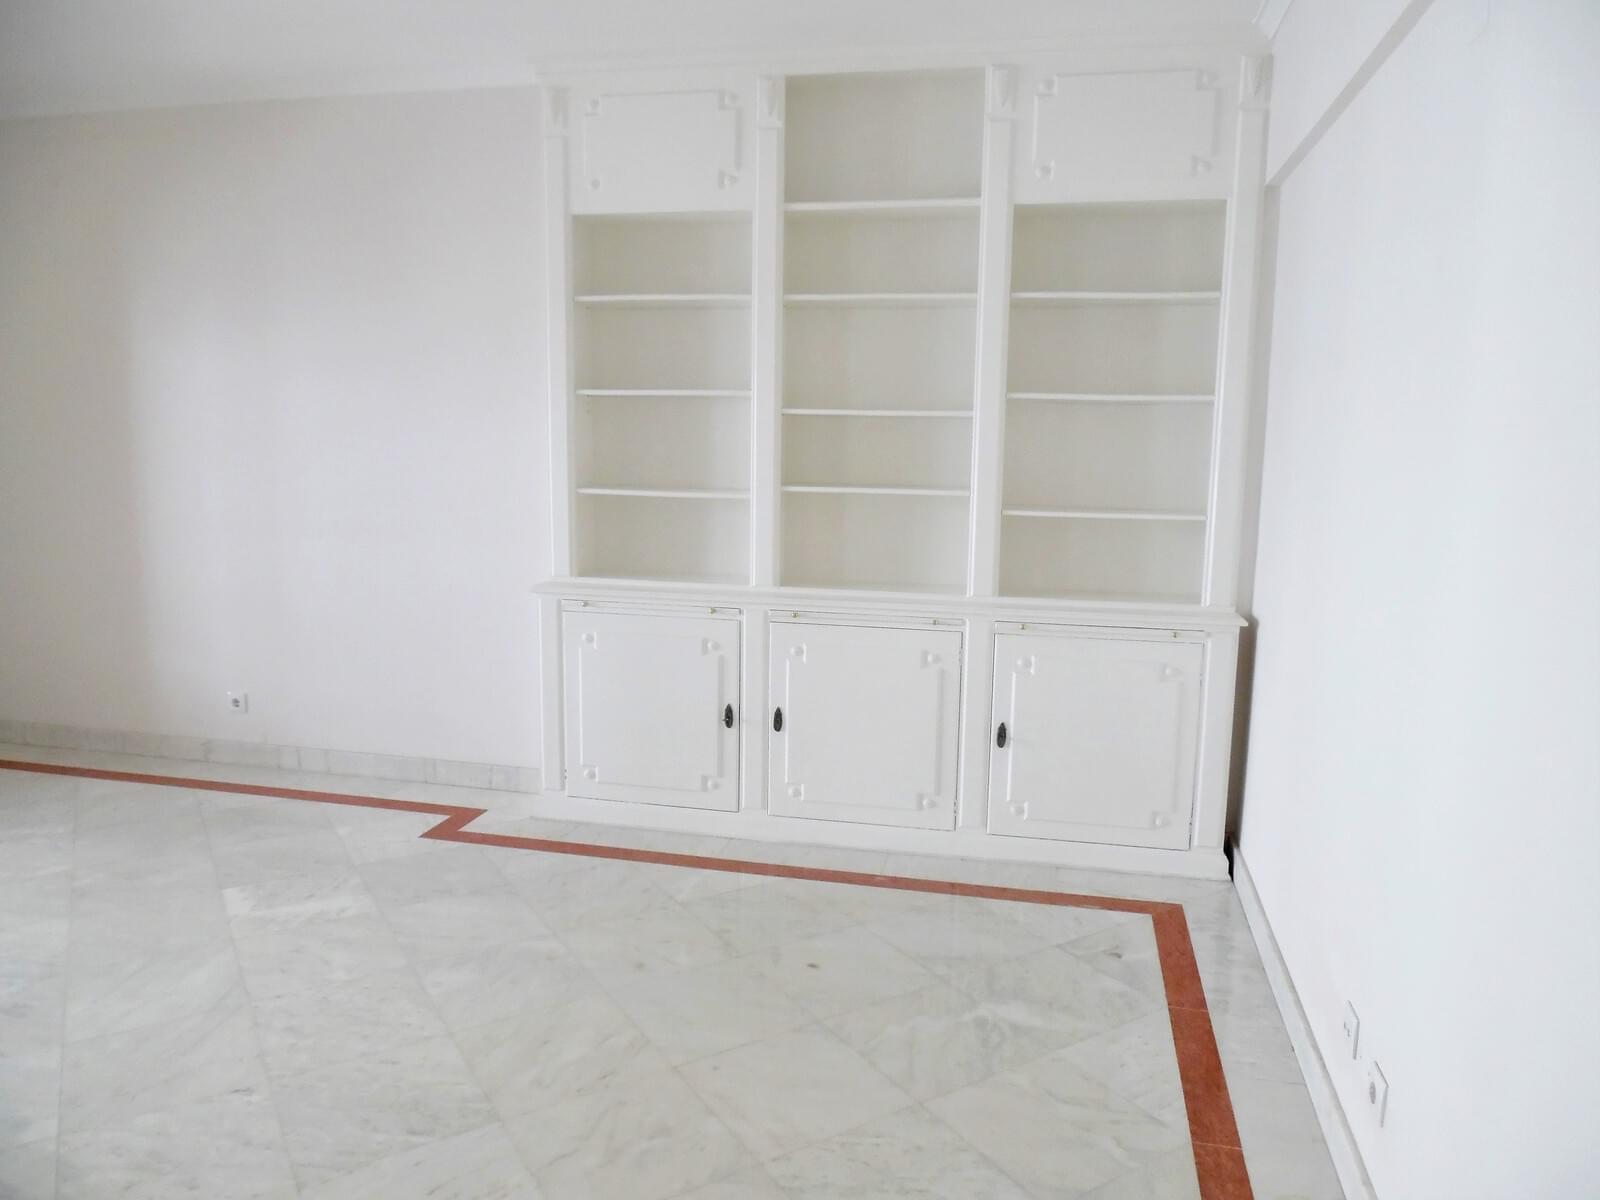 pf17621-apartamento-t4-lisboa-e999a32a-ecb9-4e02-a1a0-85aaf5fc5aa8